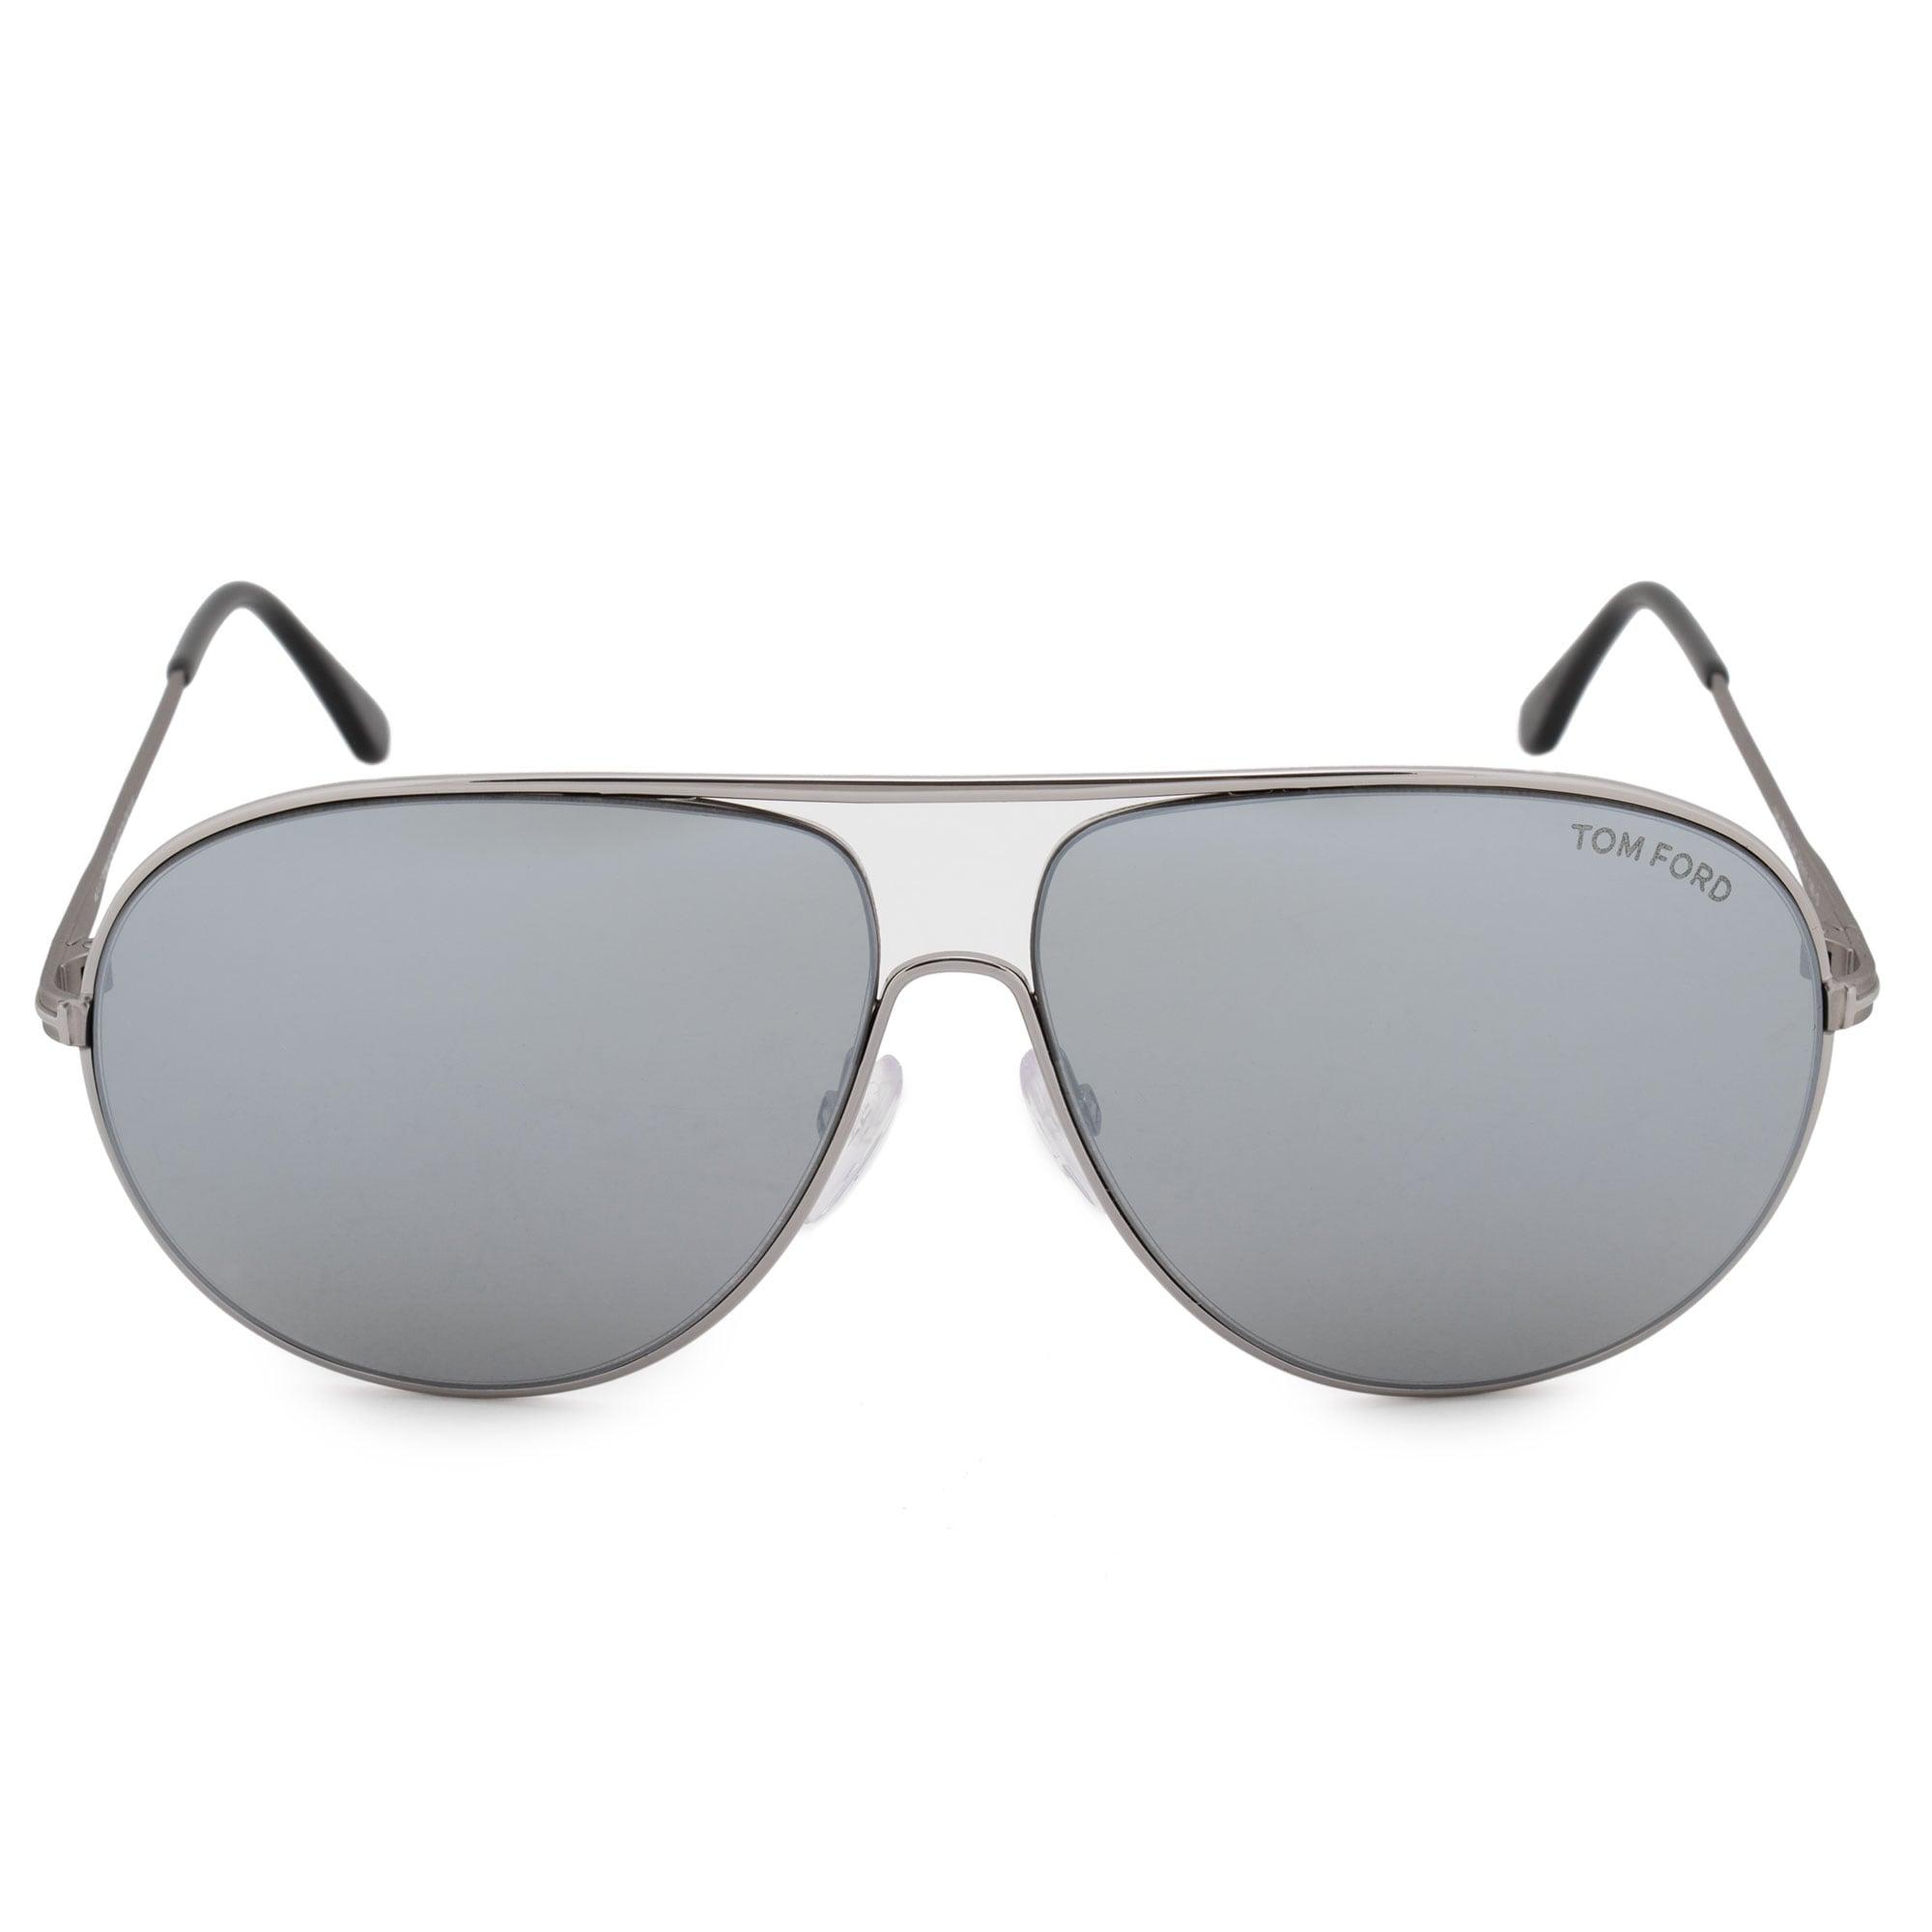 04fb949f74 Shop Tom Ford Cliff Aviator Sunglasses FT0450 14C 61 - Free Shipping ...